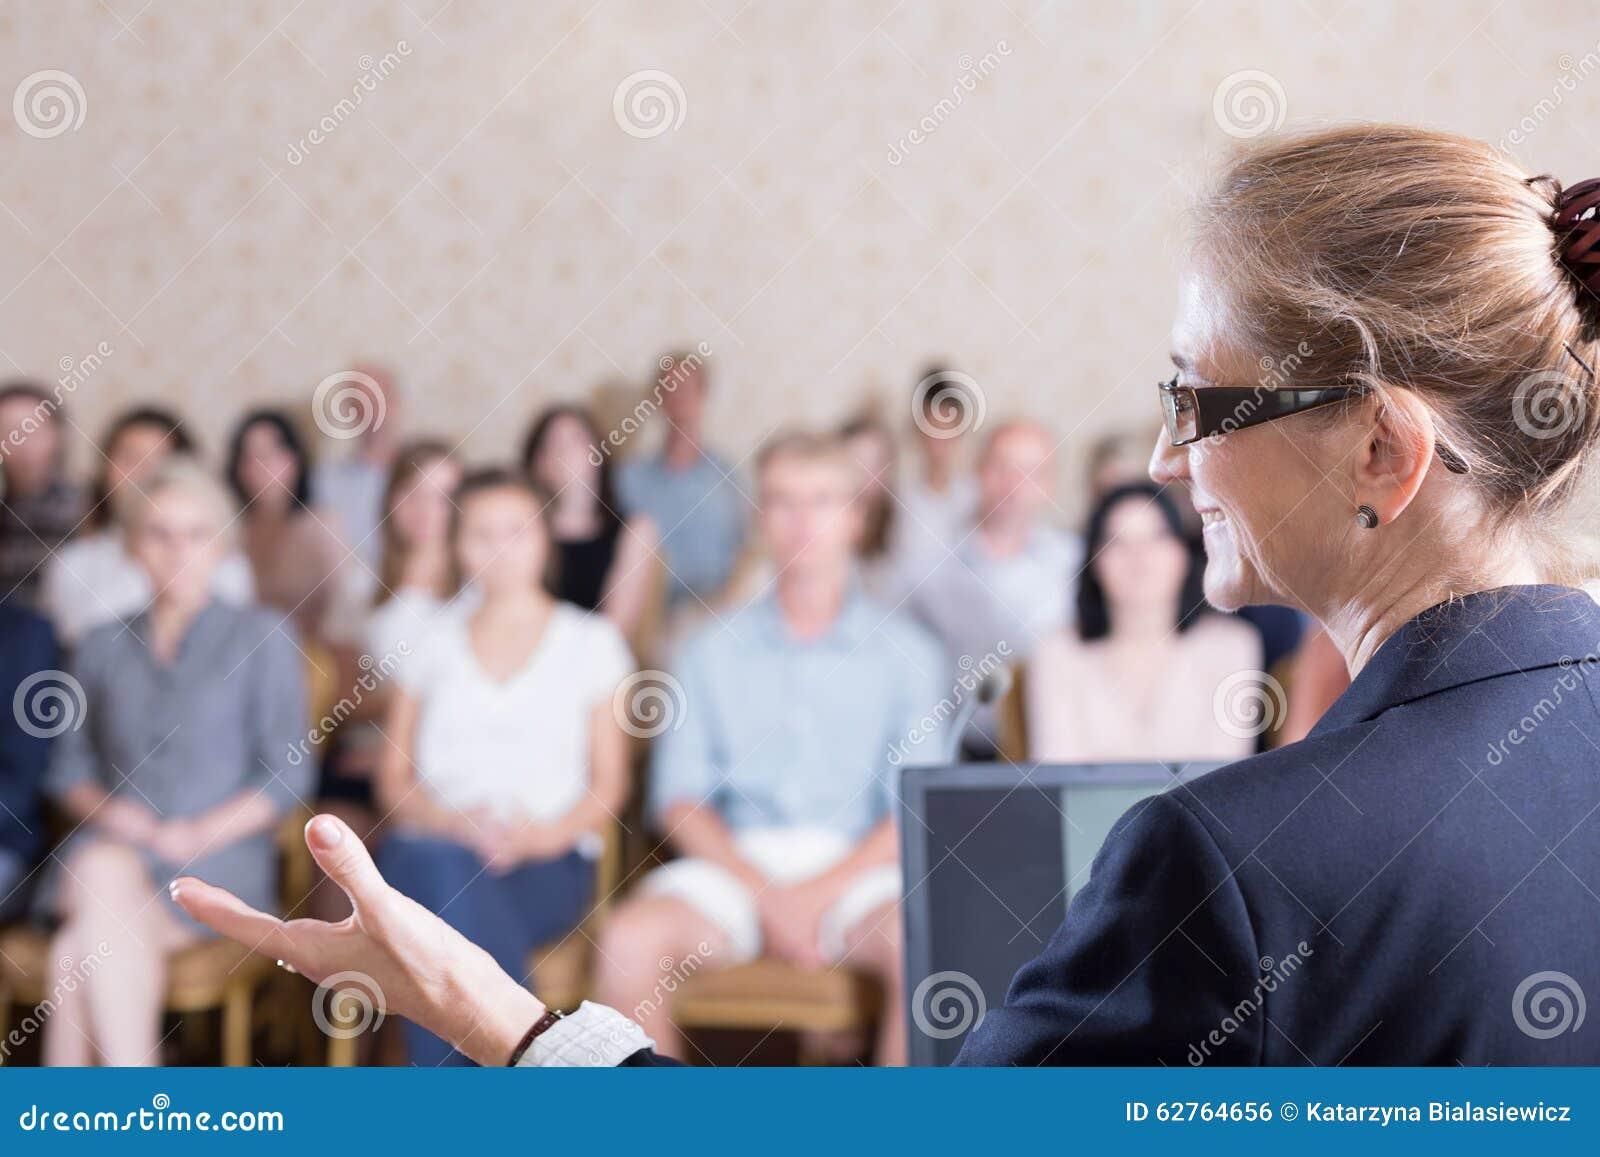 Parler pendant la formation